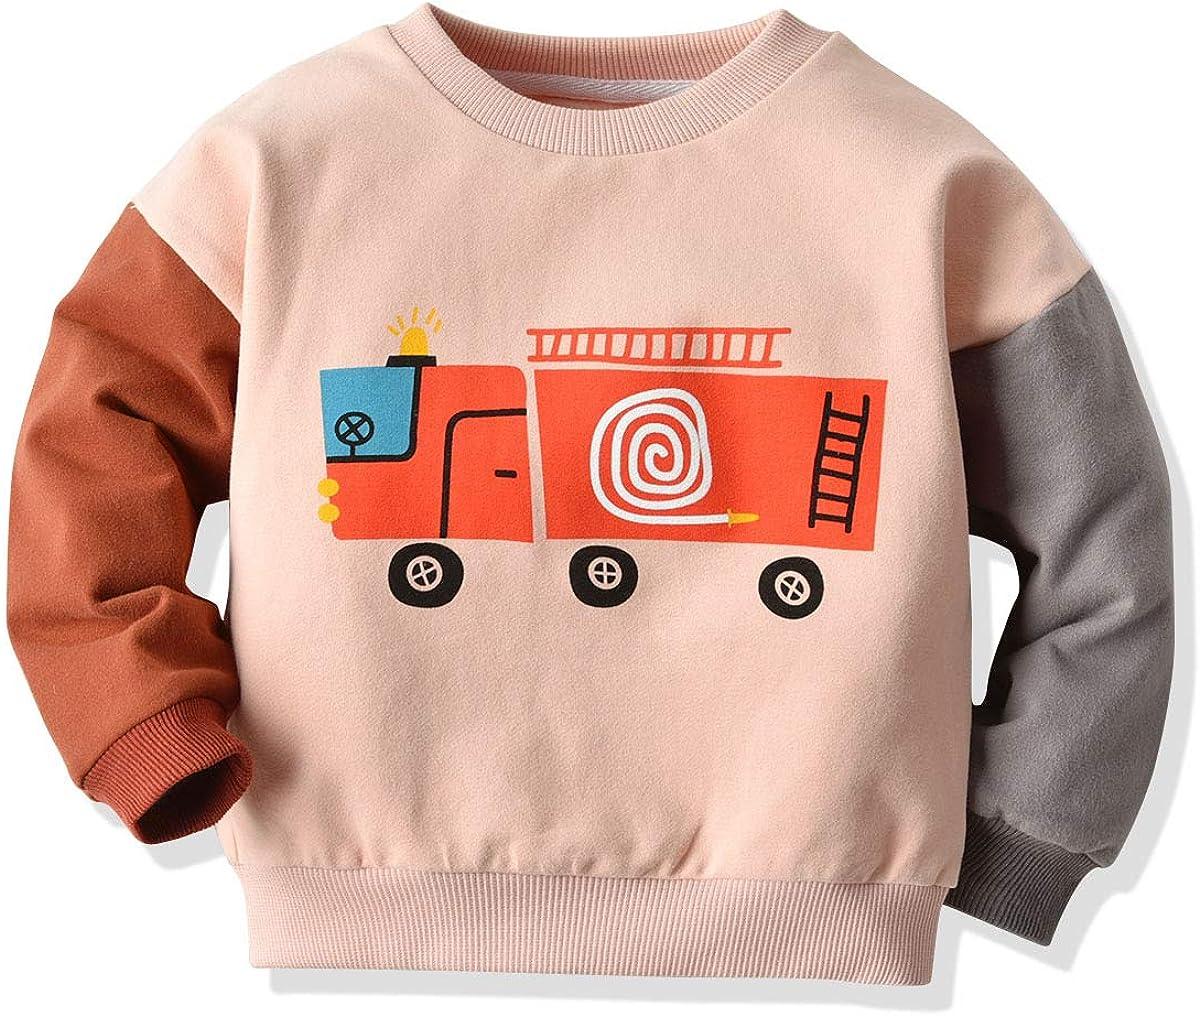 Toddler Baby Boys Crewneck Sweatshirt Top Long Sleeve Car Print Tee Shirt Casual Spring Clothes